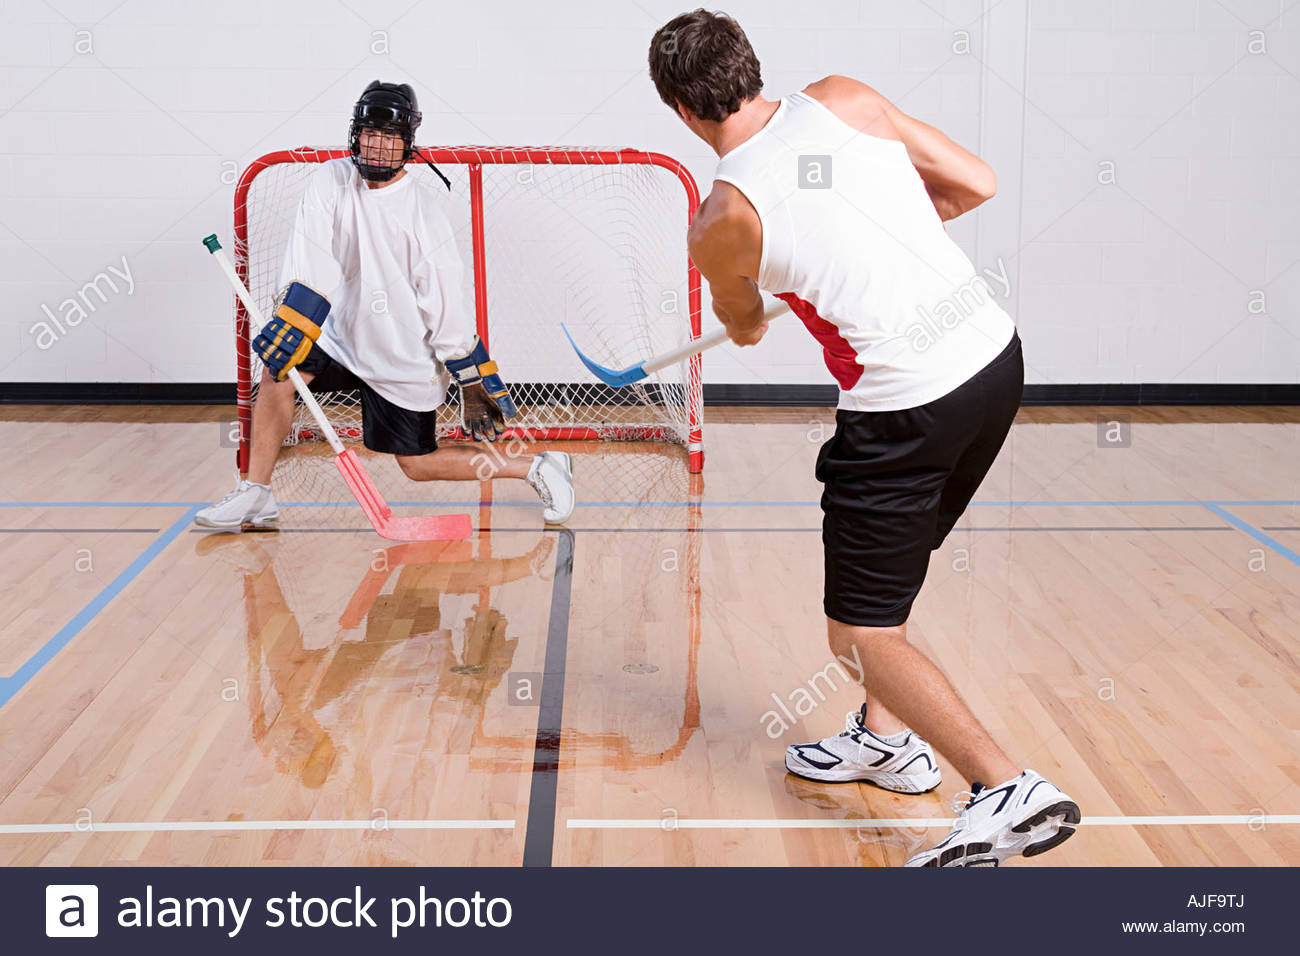 Gardien de hockey faire une sauvegarde Photo Stock